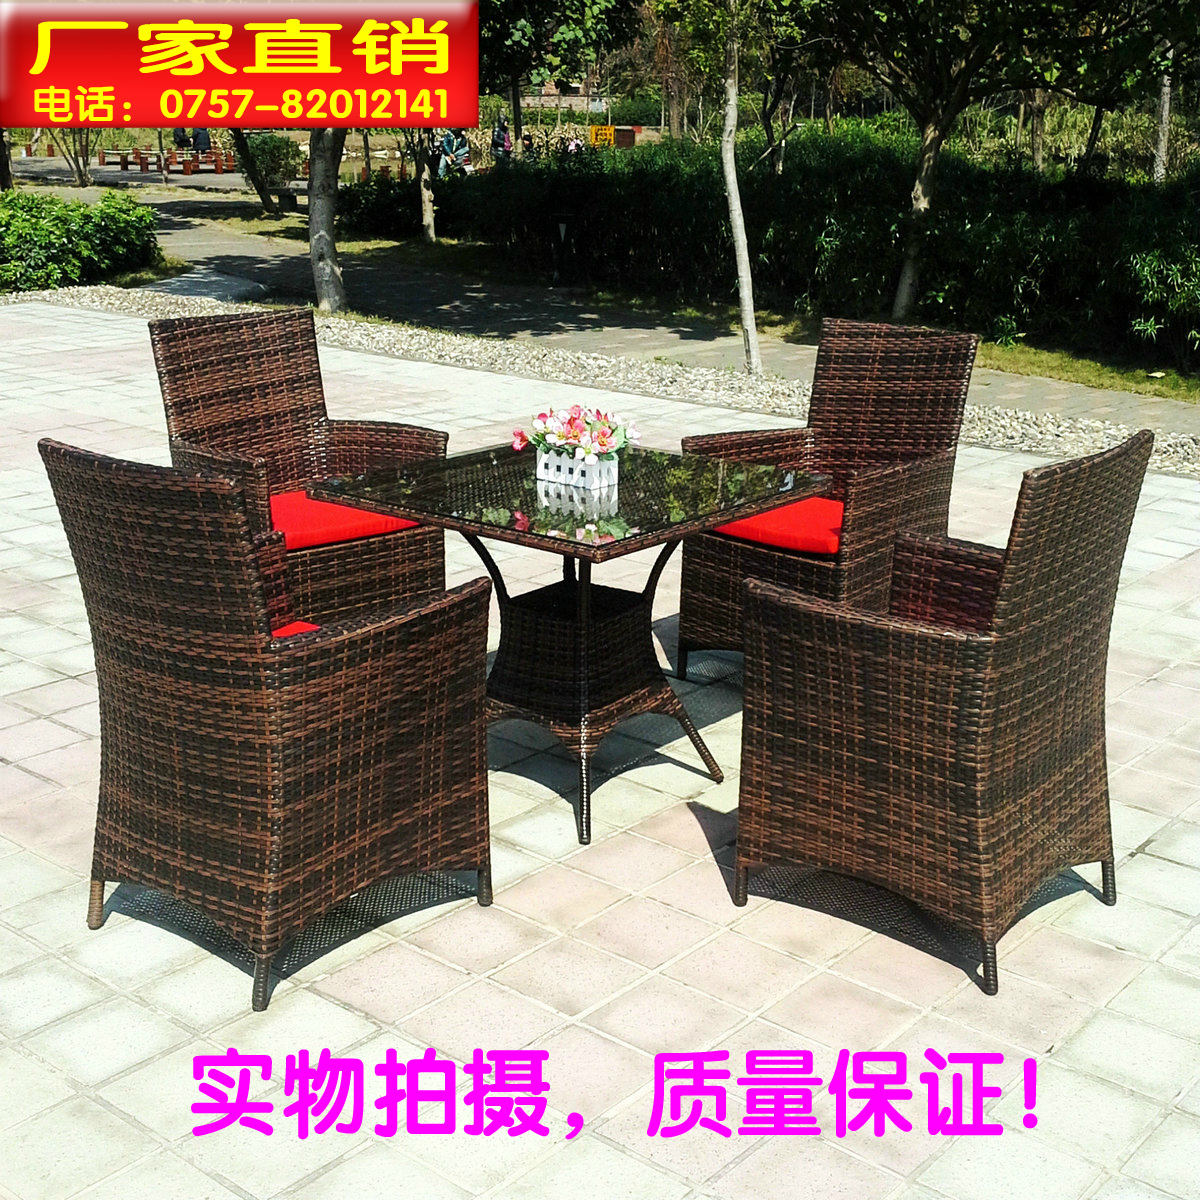 набор складной мебели Yu Jia rattan канцтовары ru yi yu 2396